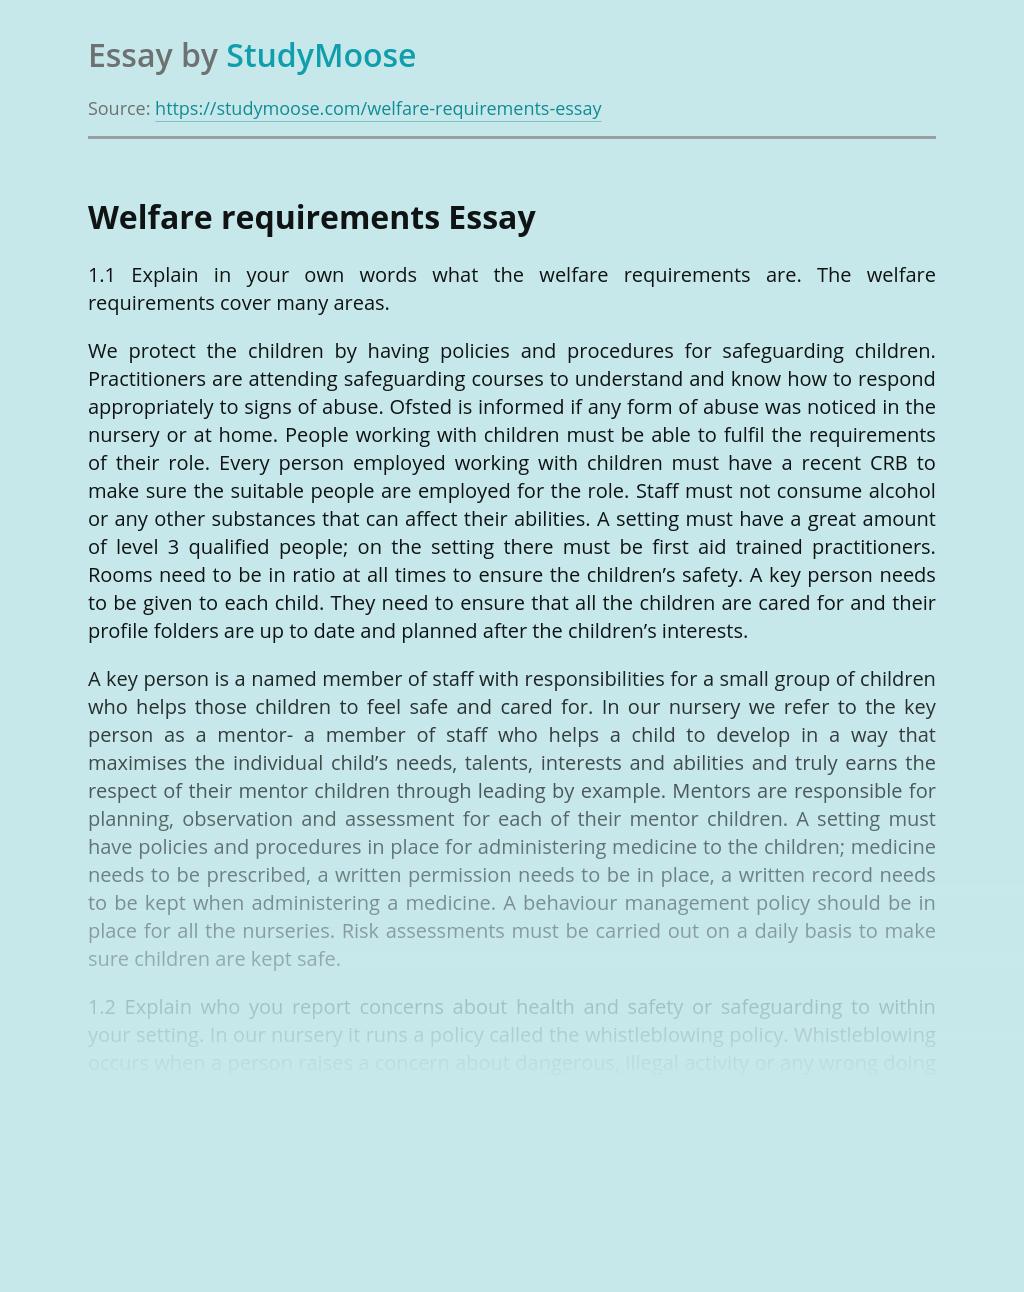 Welfare requirements